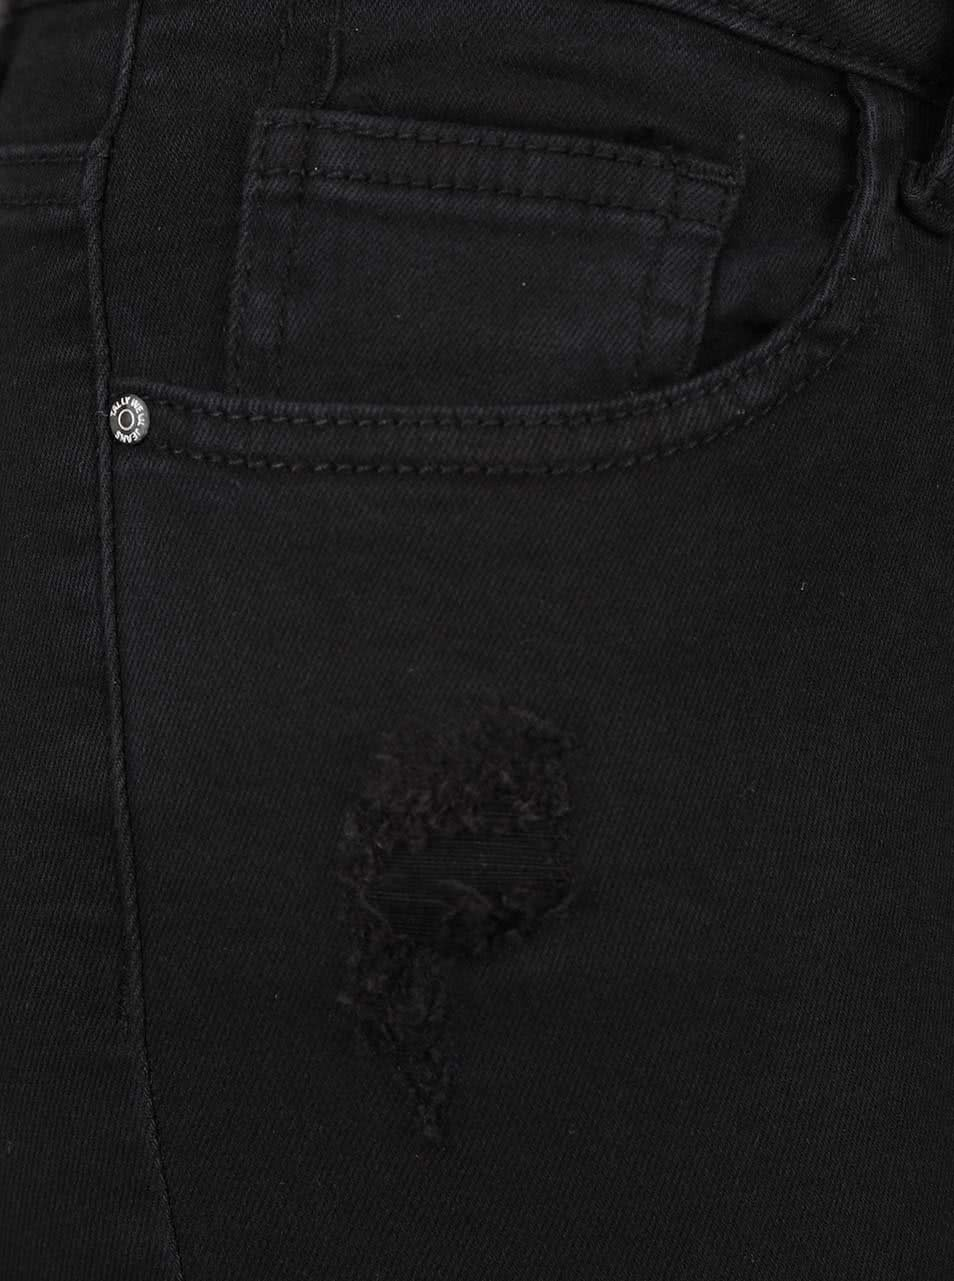 b8c6301e0db Černé elastické džíny s potrhaným efektem TALLY WEiJL ...